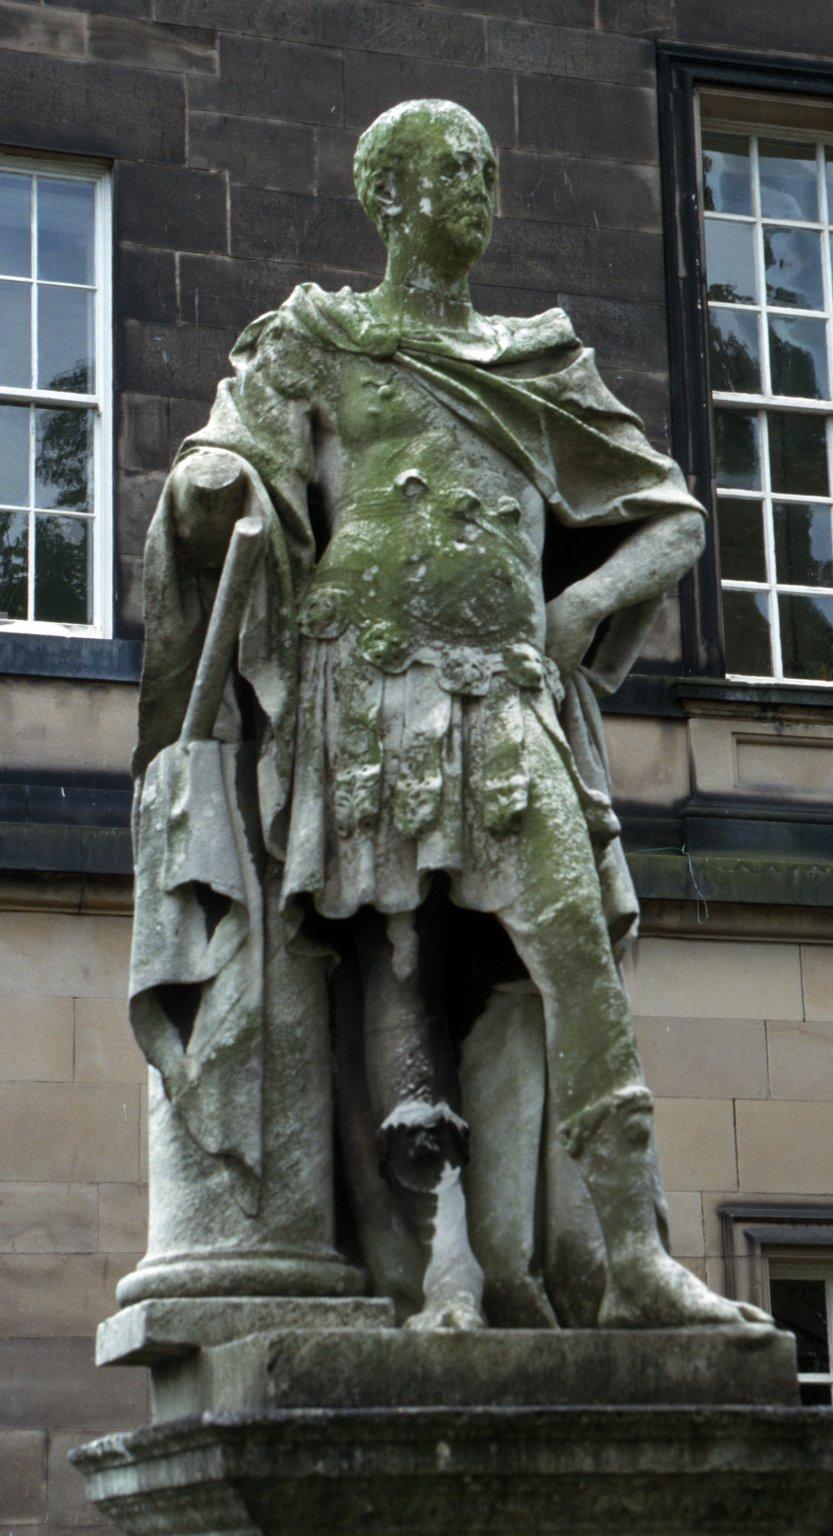 Thomas Wentworth, 1st Earl of Stafford (2nd Creation)